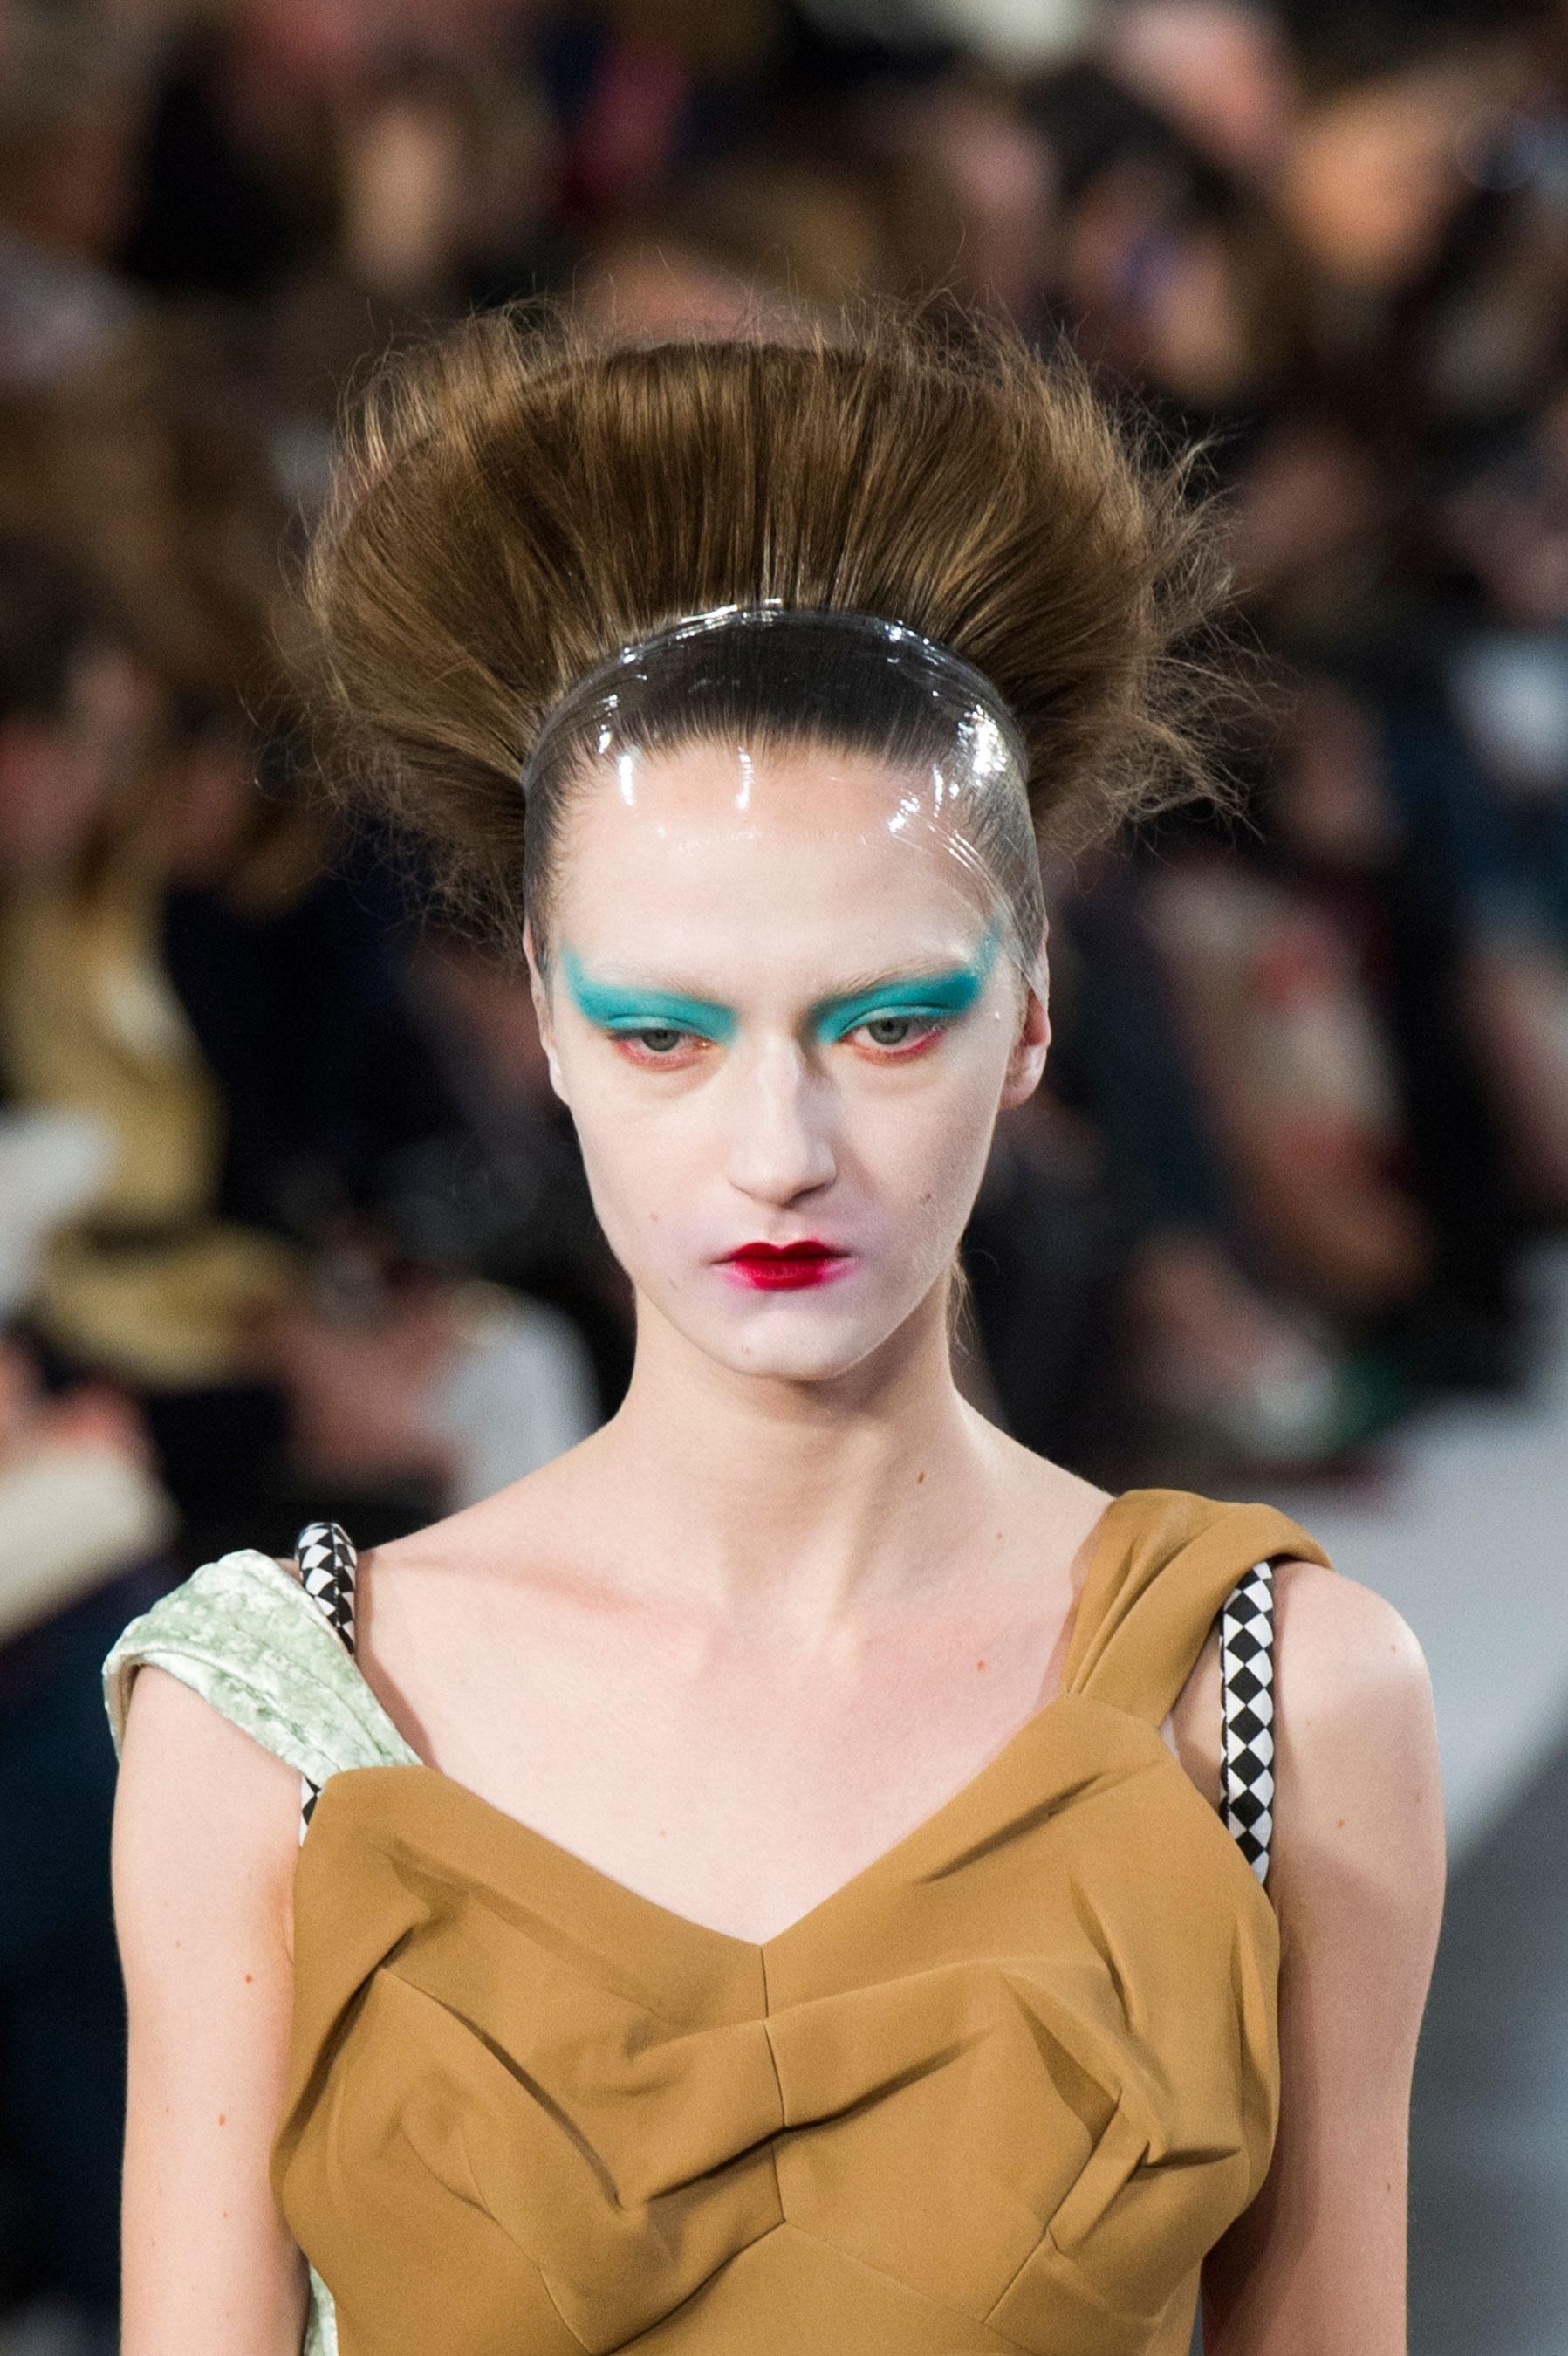 Maison-Margiela-spring-2016-runway-beauty-fashion-show-the-impression-103